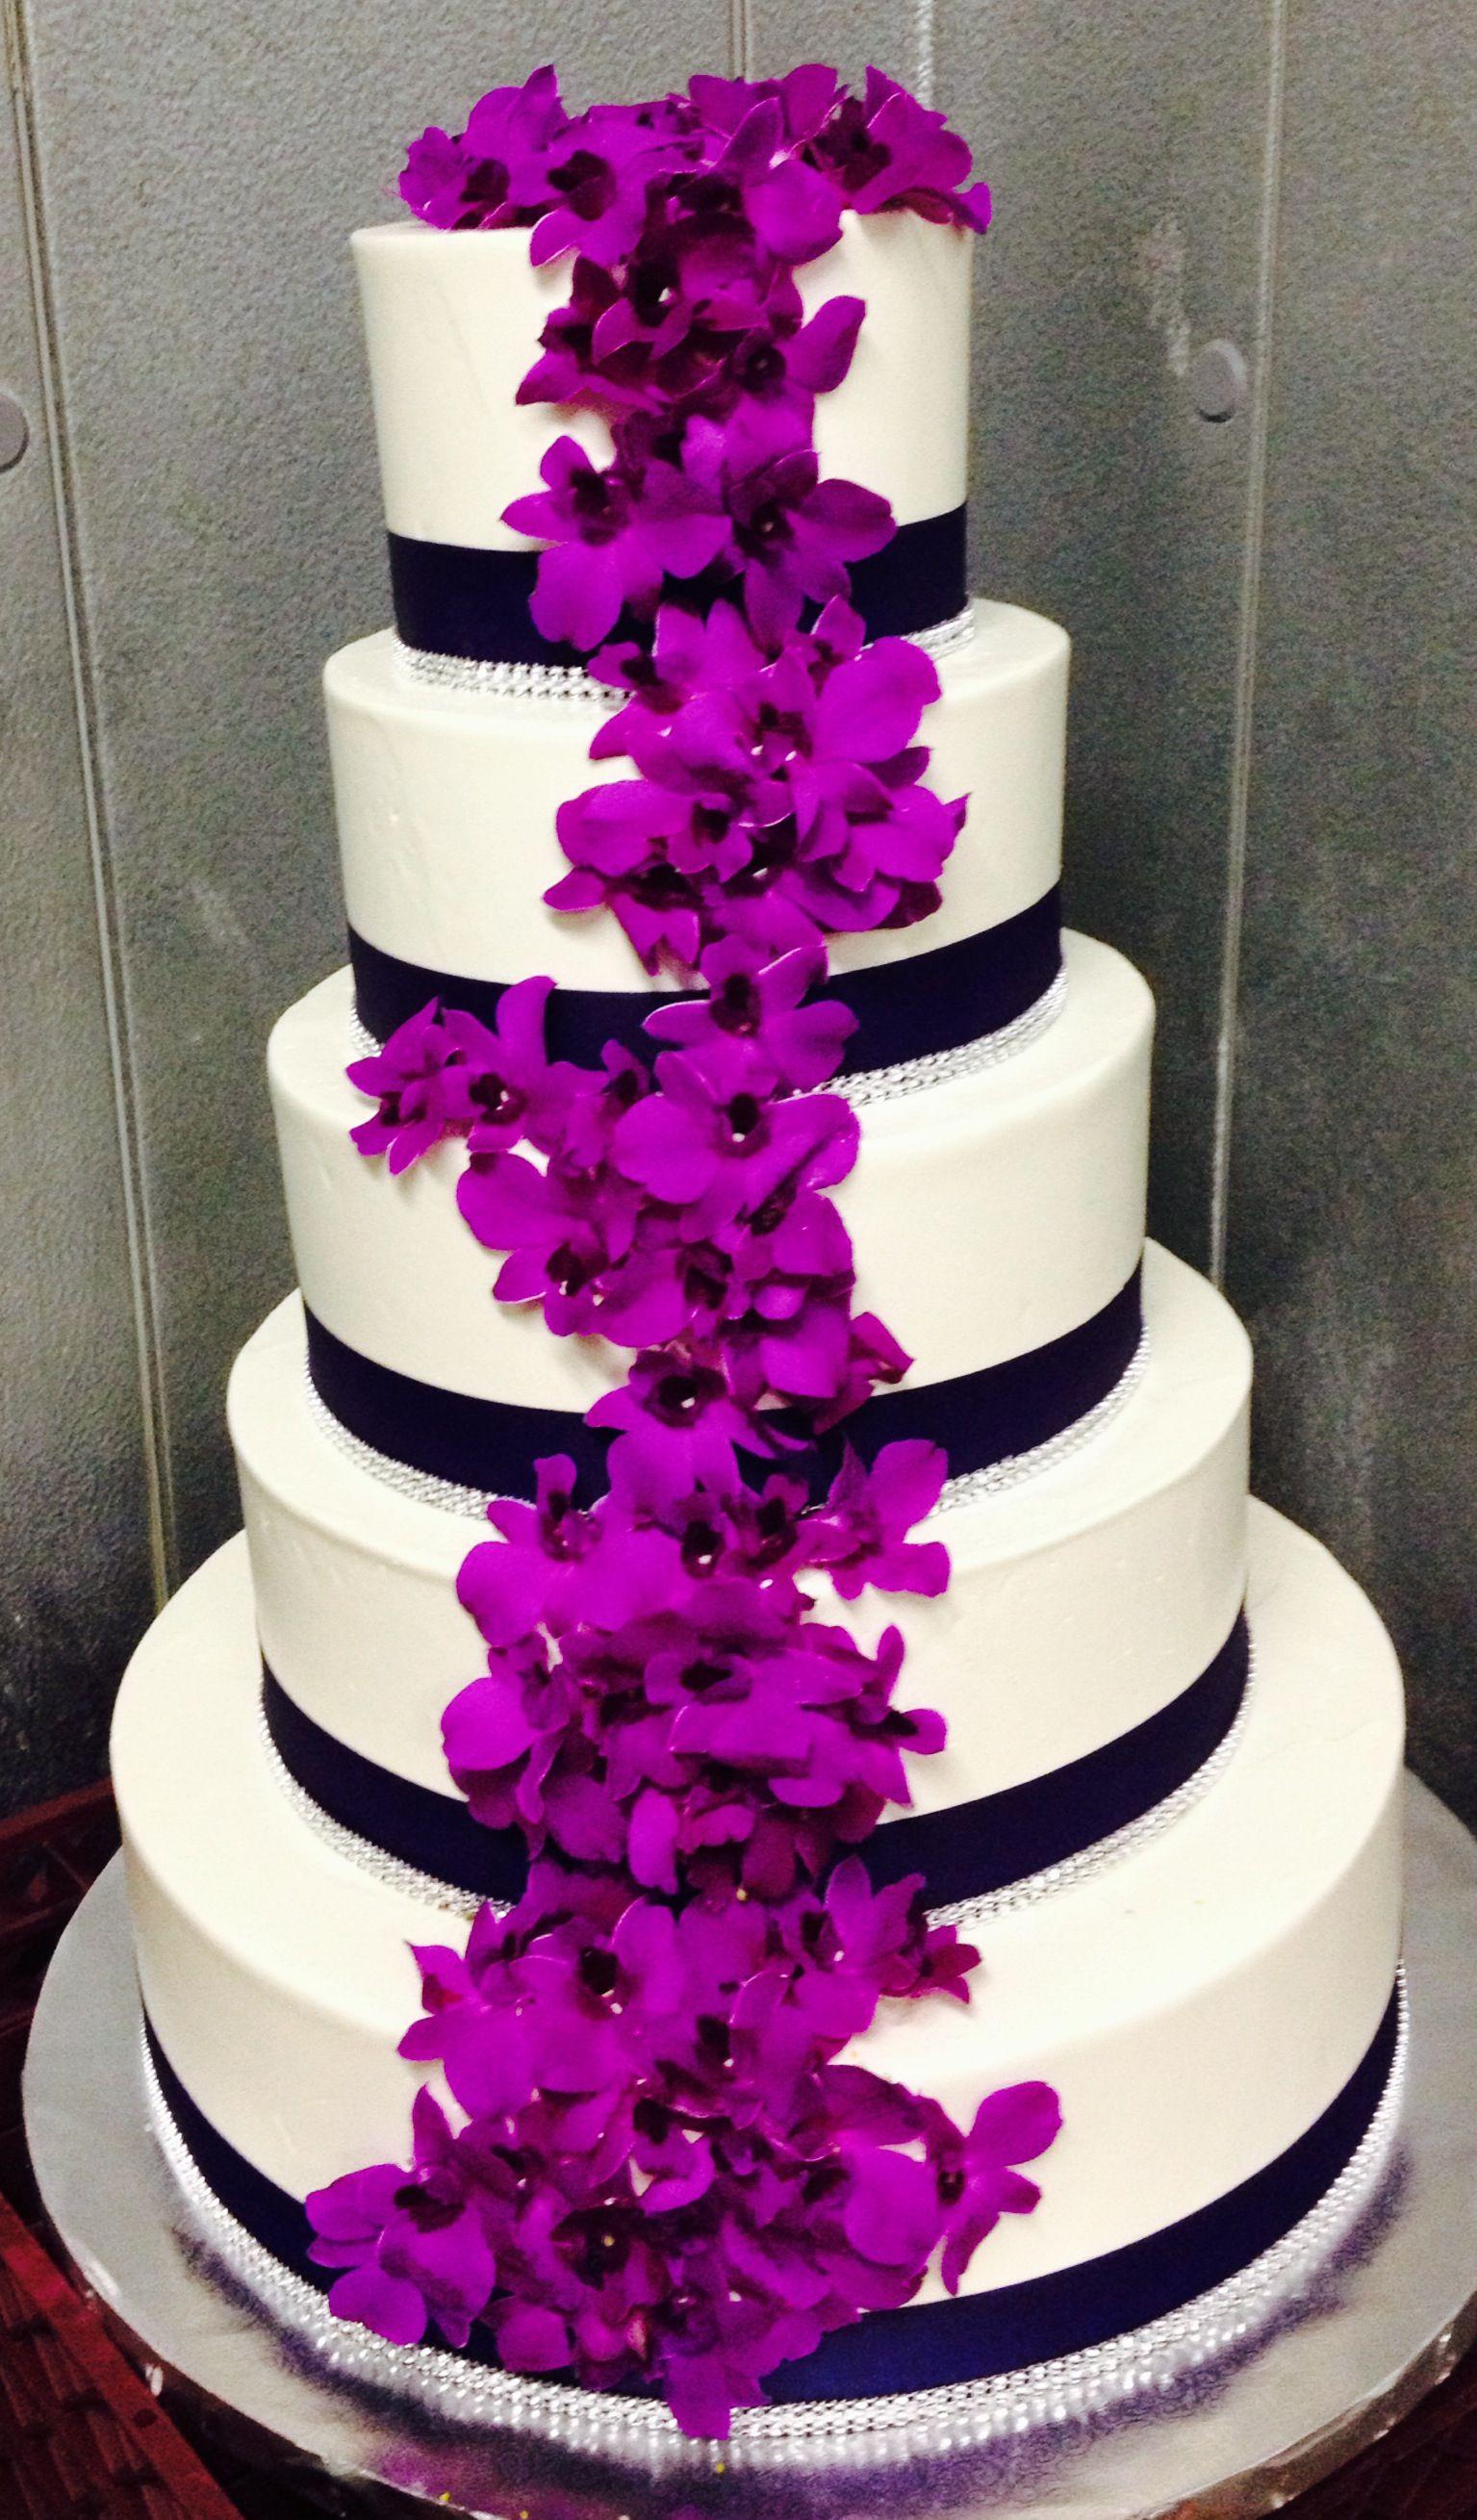 Pin by Marquita McGhee on Sangria wedding ideas | Pinterest